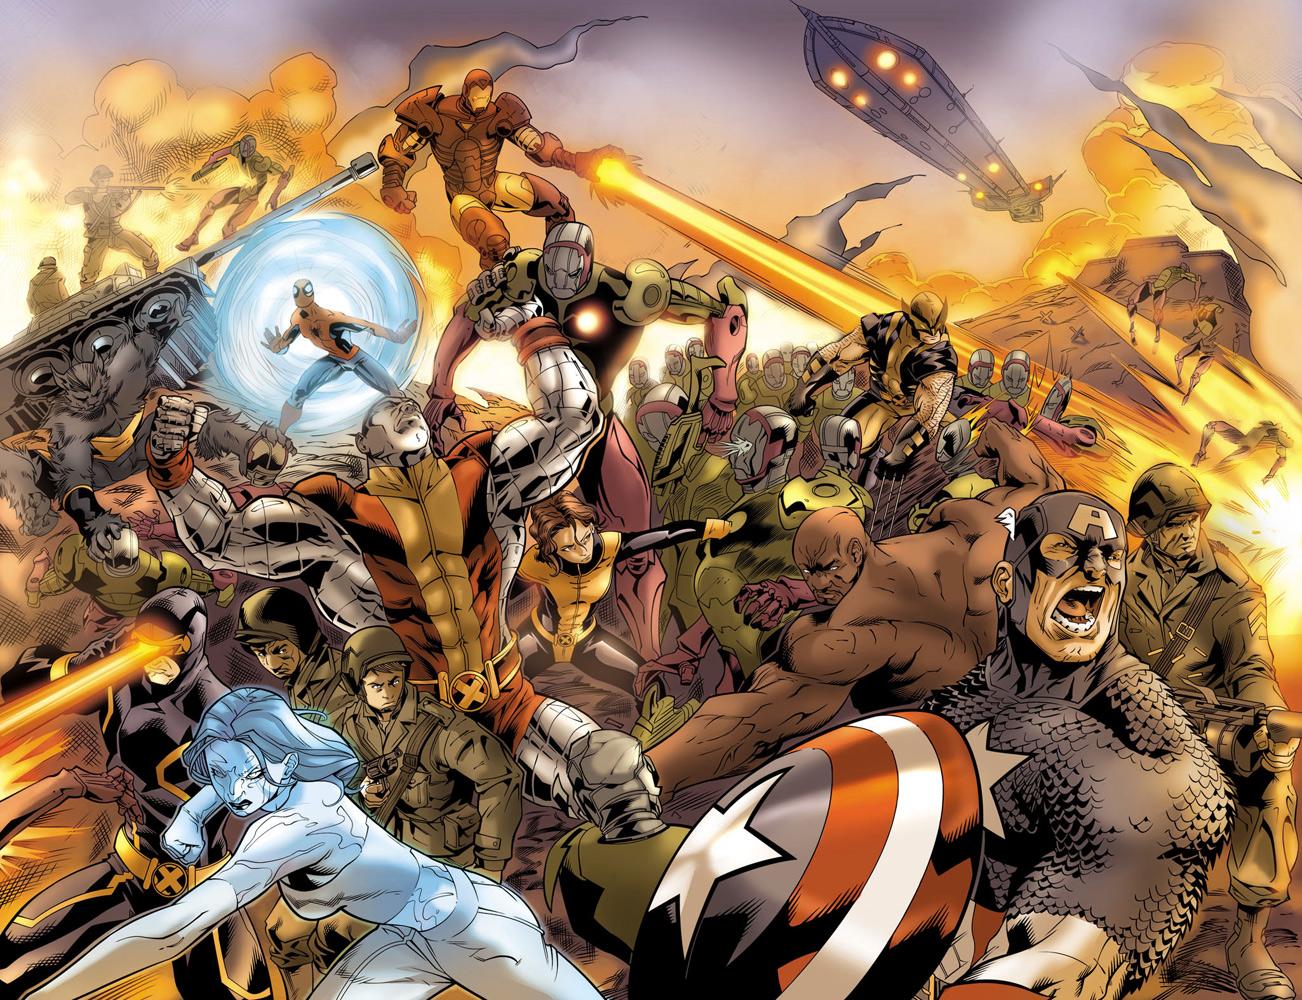 X-Men-Avengers 2 Page Spread